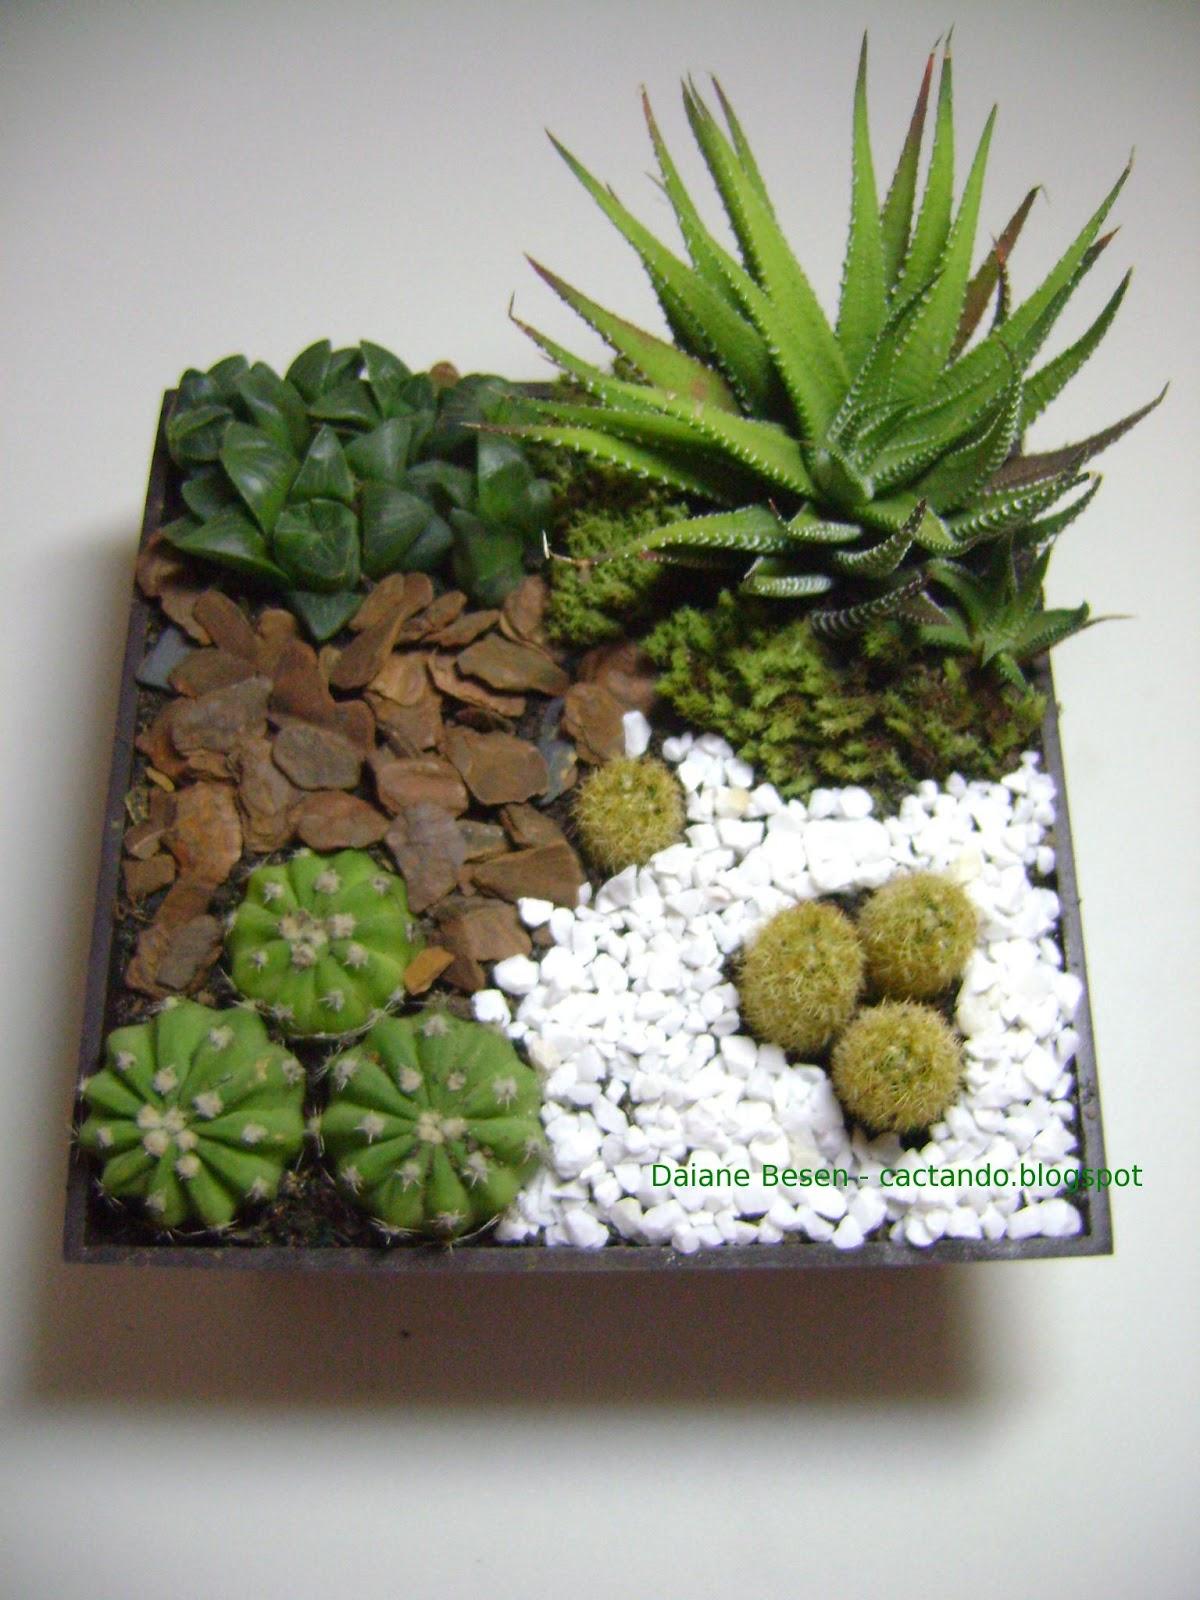 mini jardim de suculentas passo a passo : mini jardim de suculentas passo a passo:quinta-feira, 9 de maio de 2013